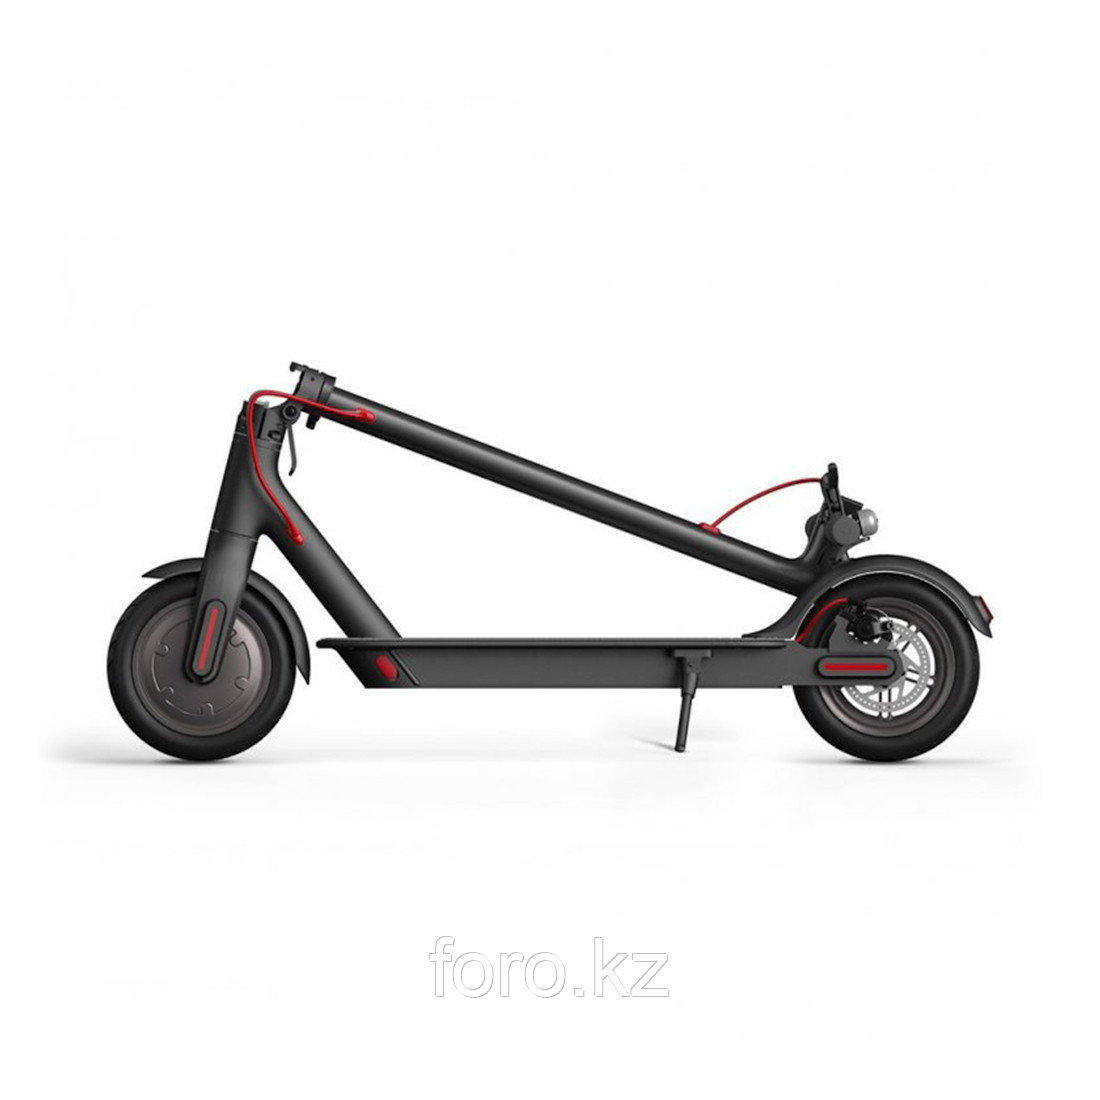 Электросамокат Xiaomi MiJia Smart Electric Scooter (M365) Чёрный - фото 3